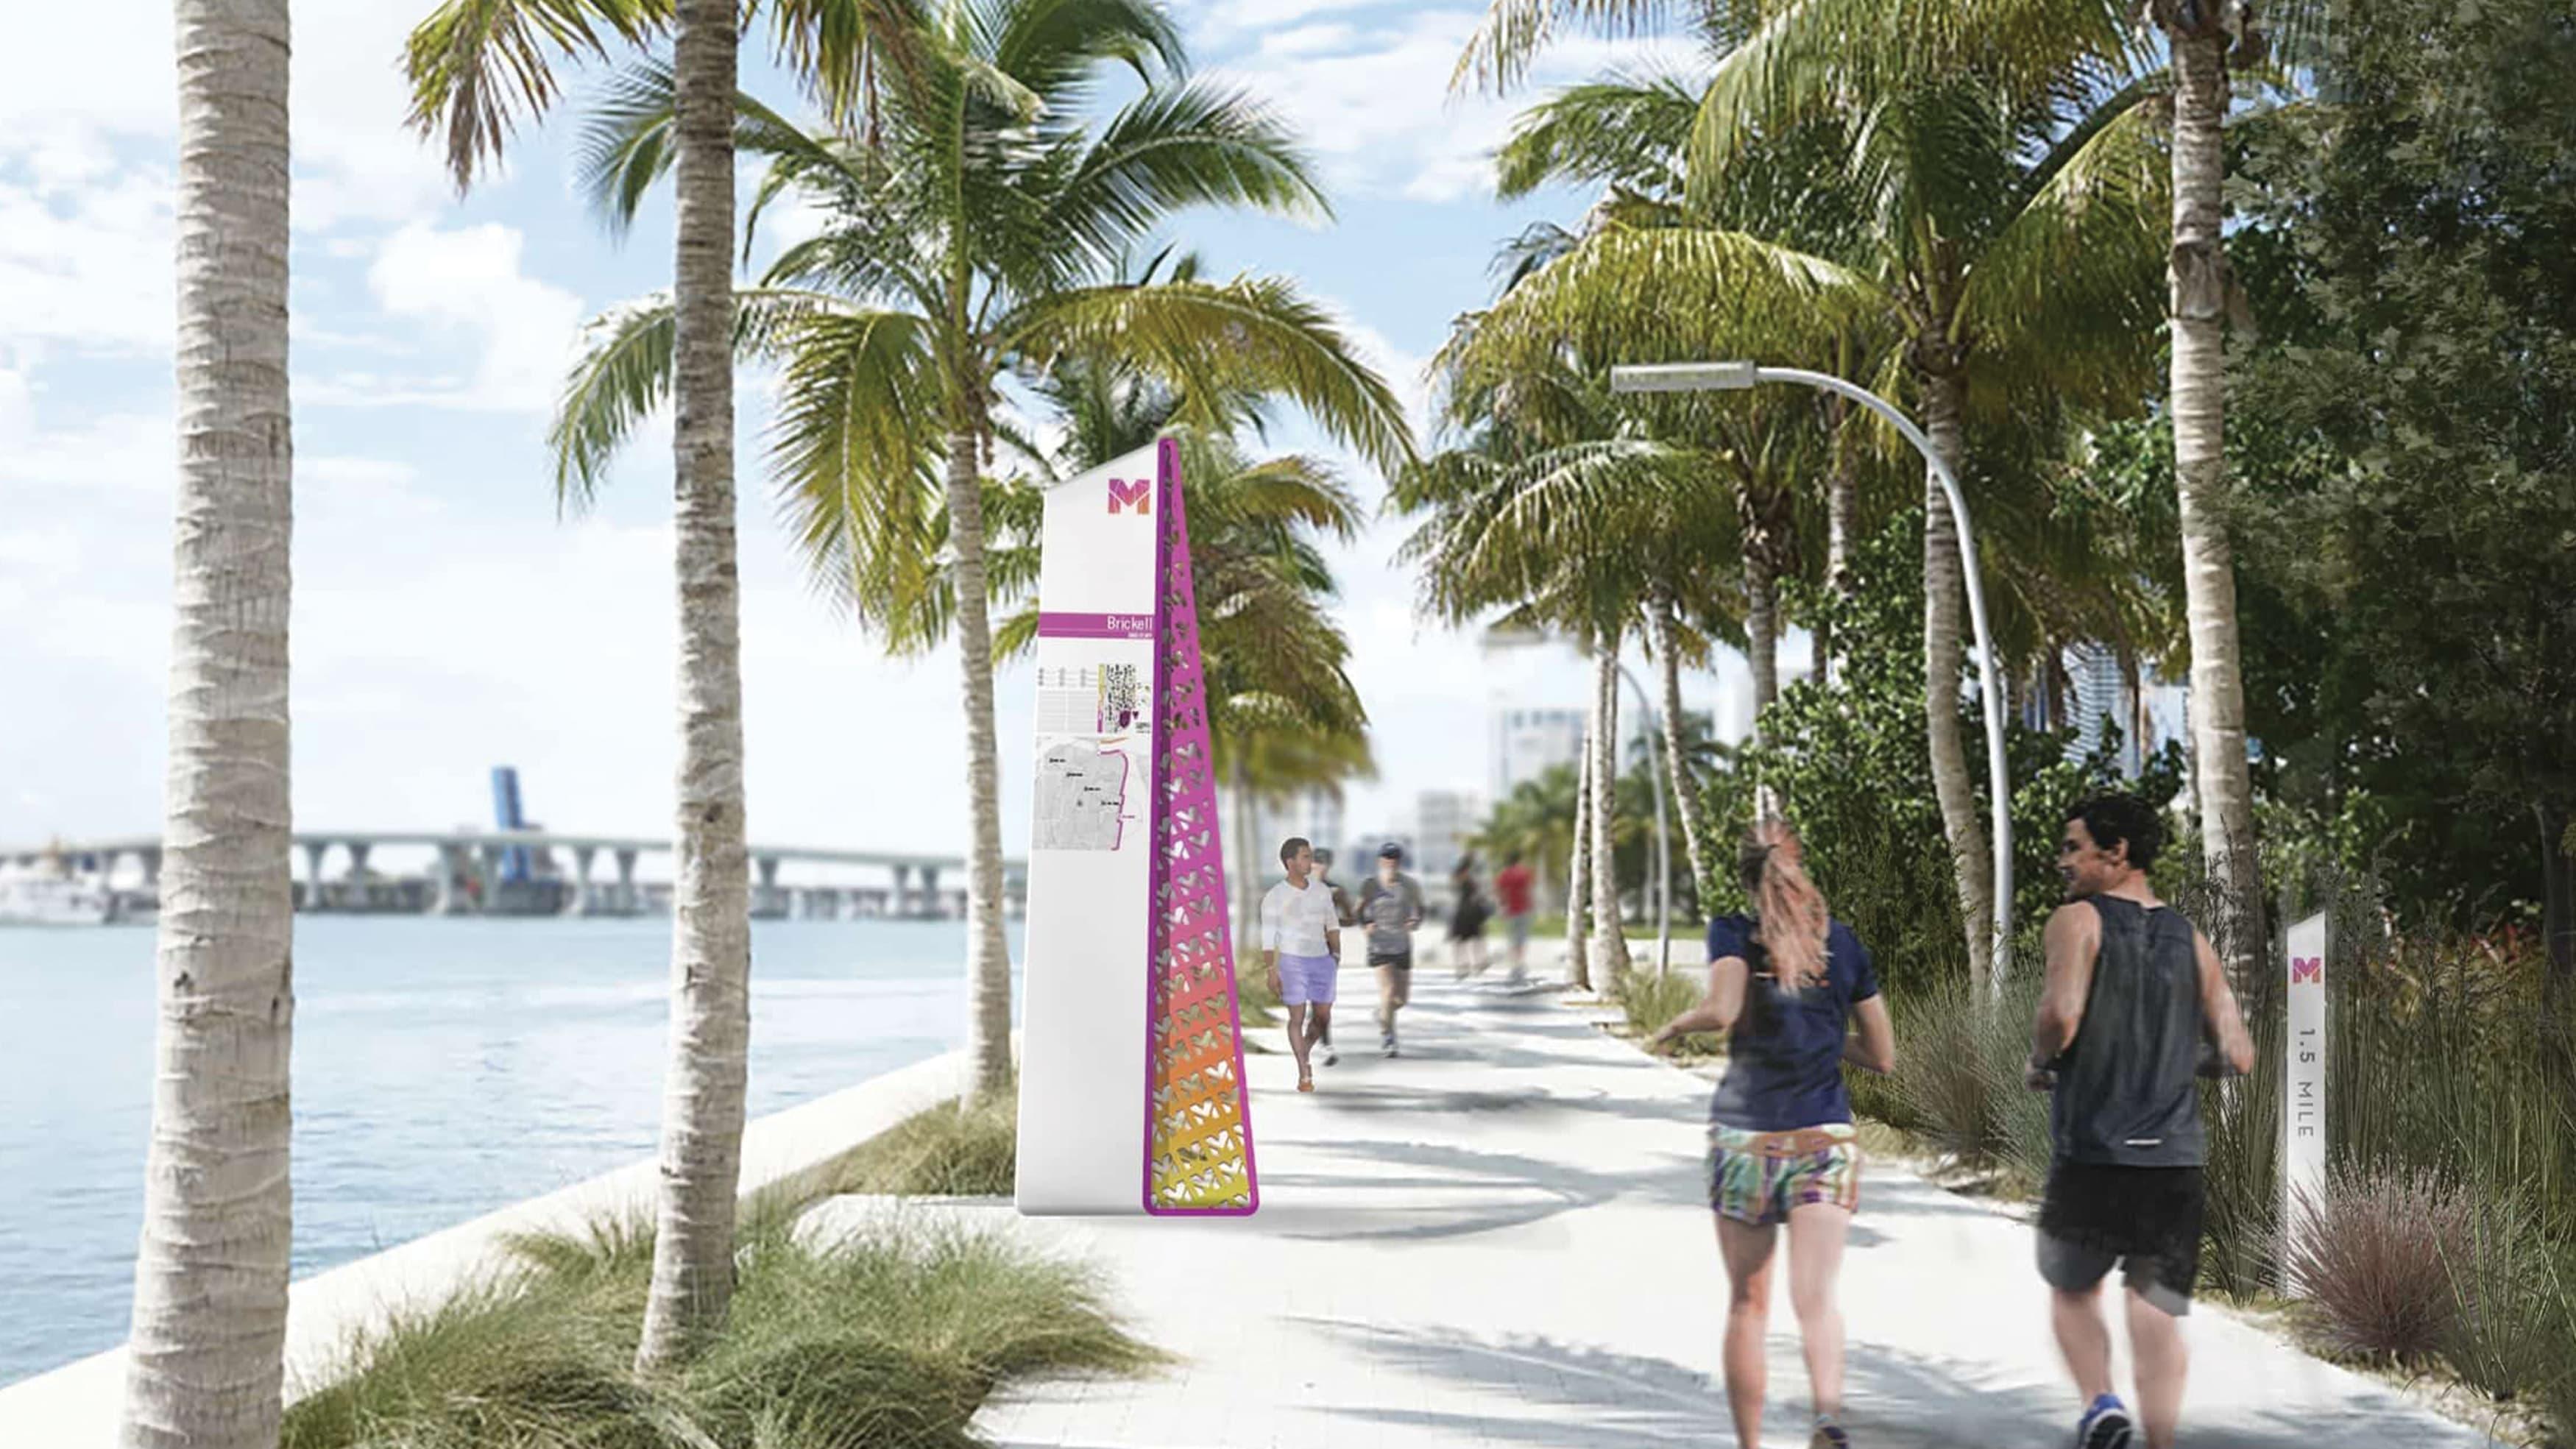 Miami Baywalk wayfinding signage along the waterfront.